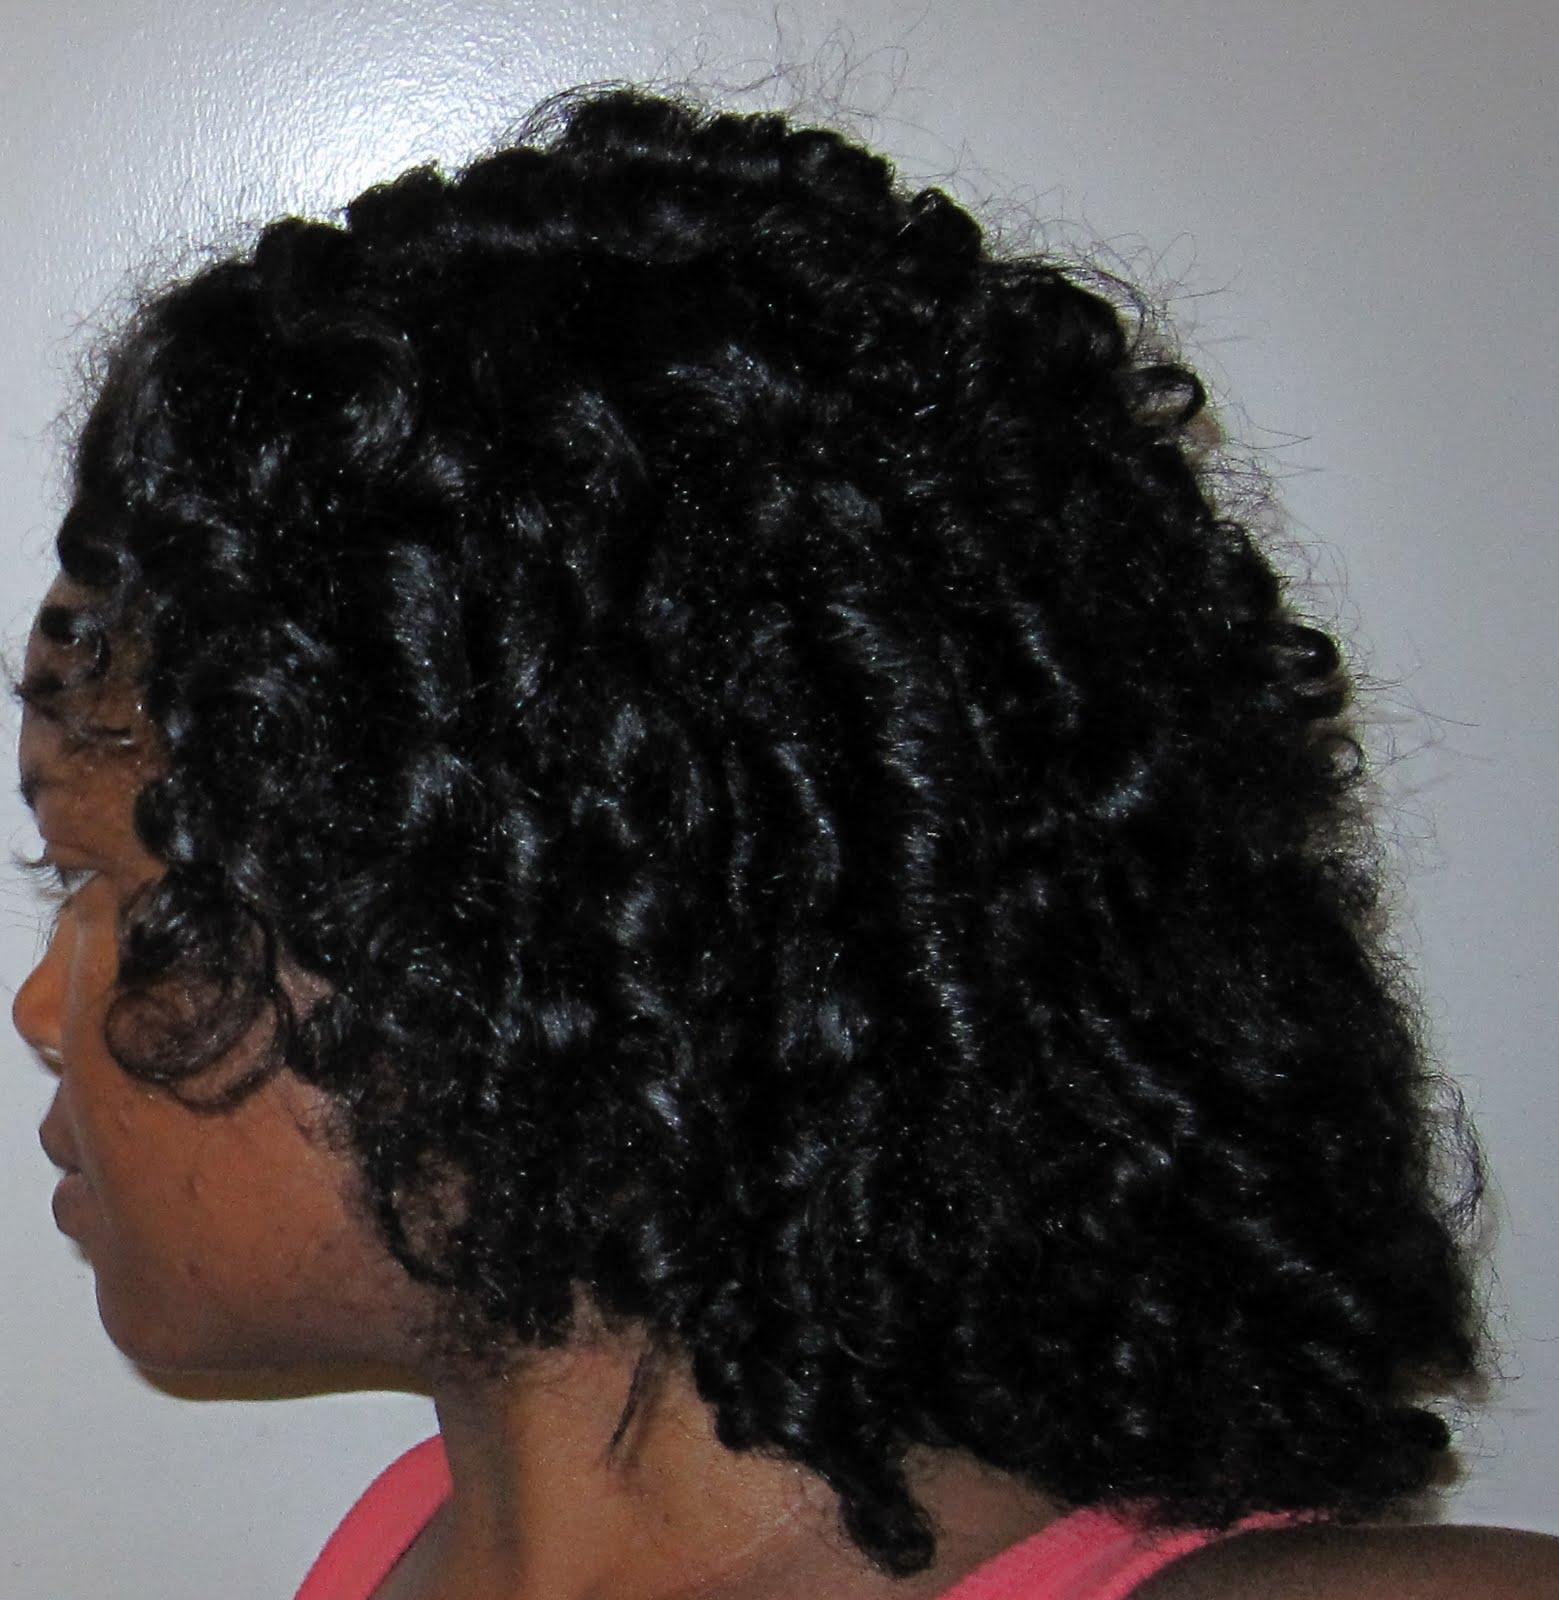 ChrsLvsBks- Naturally Glam Hair Idol